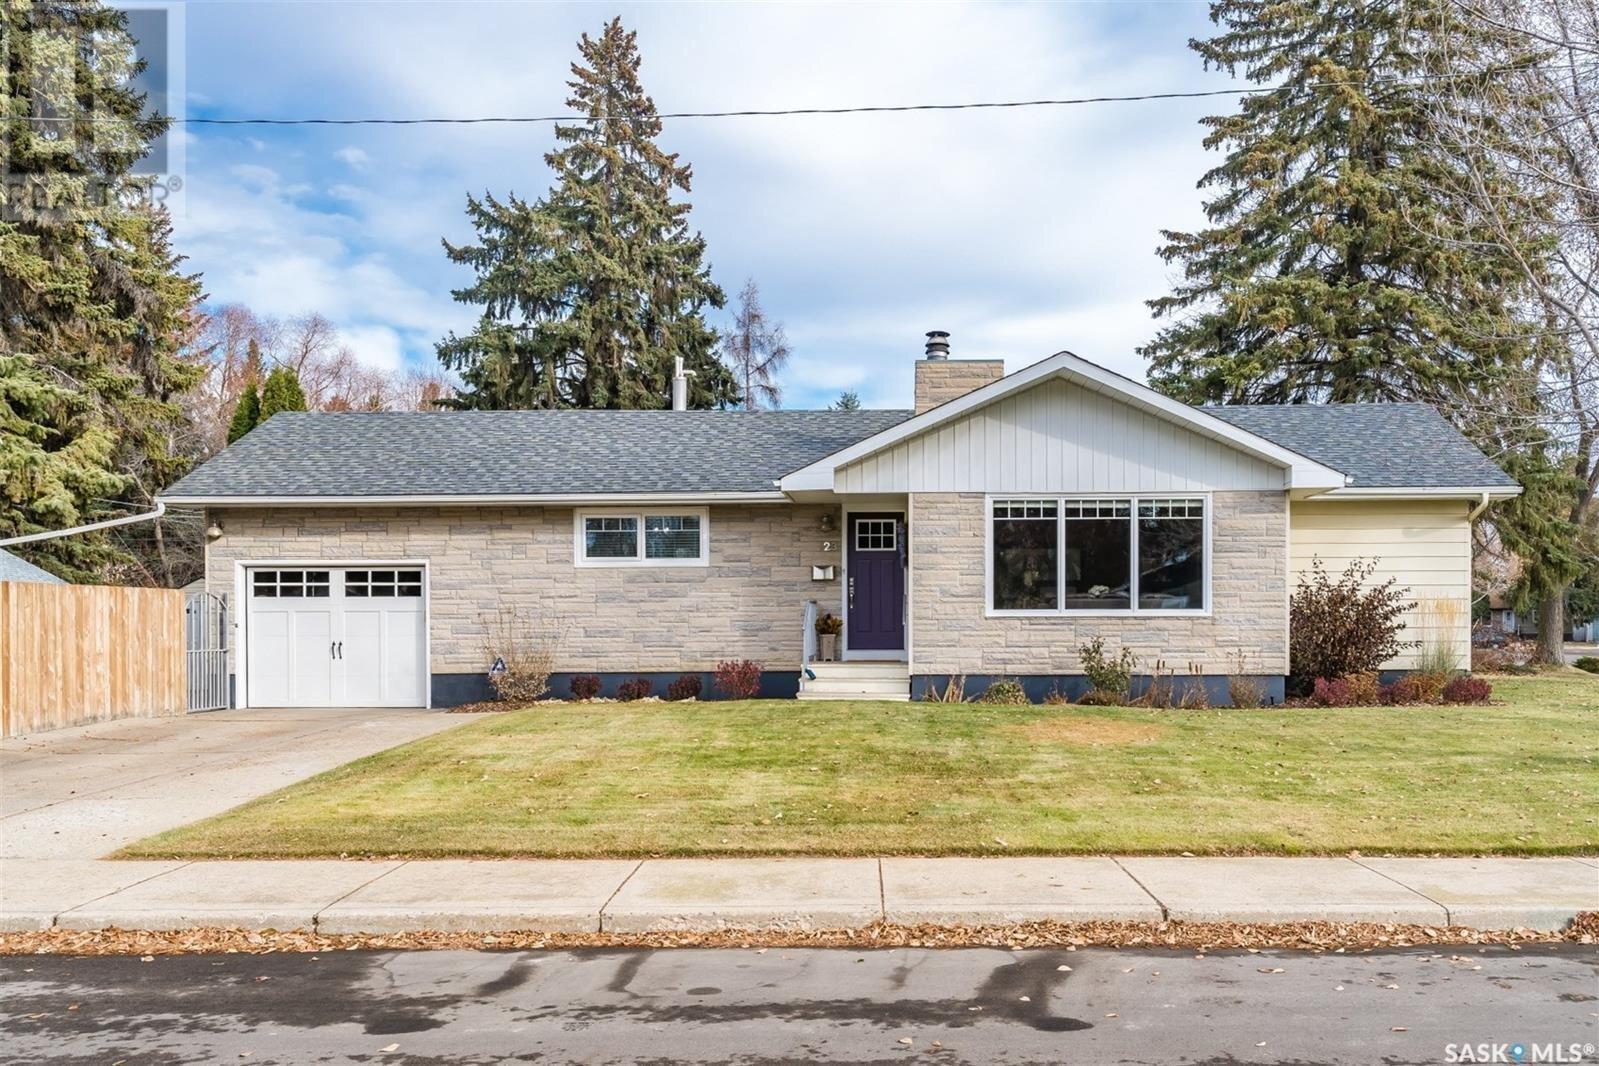 House for sale at 23 Norman Cres Saskatoon Saskatchewan - MLS: SK833424